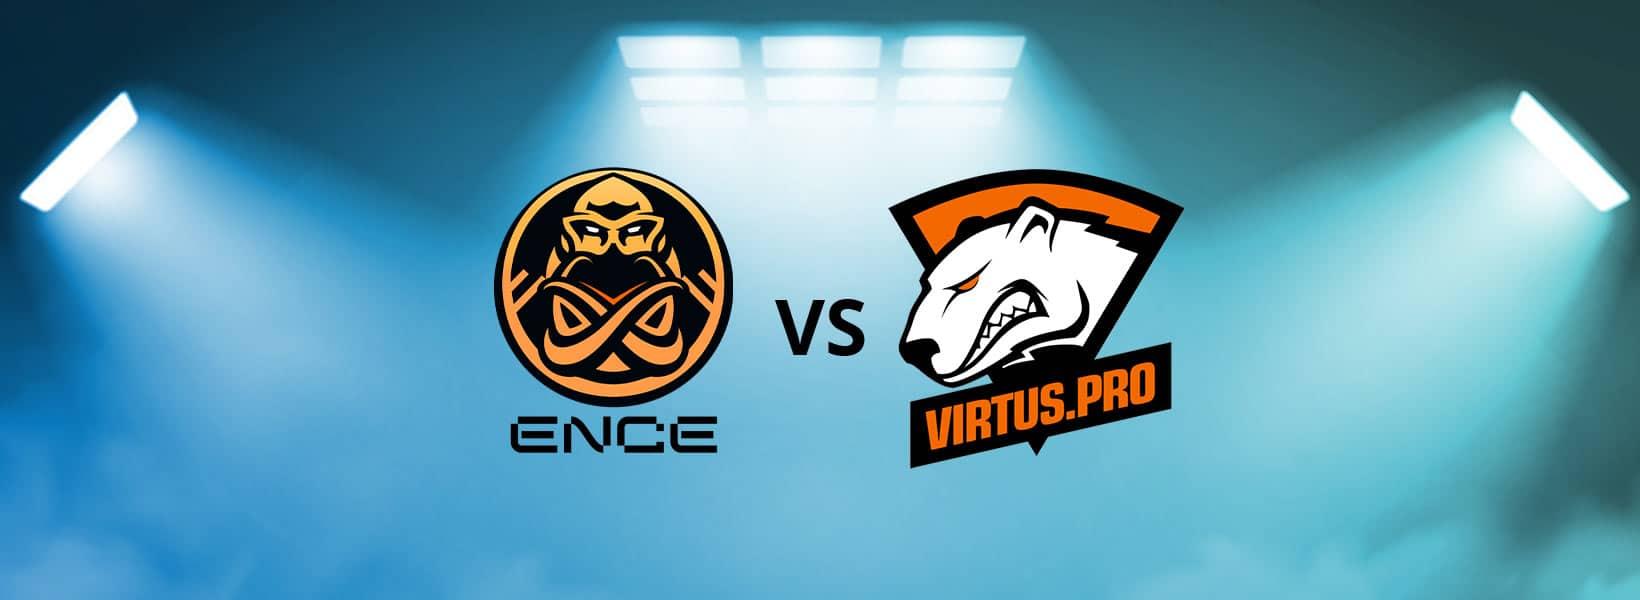 Ponturi pariuri Virtus Pro vs ENCE